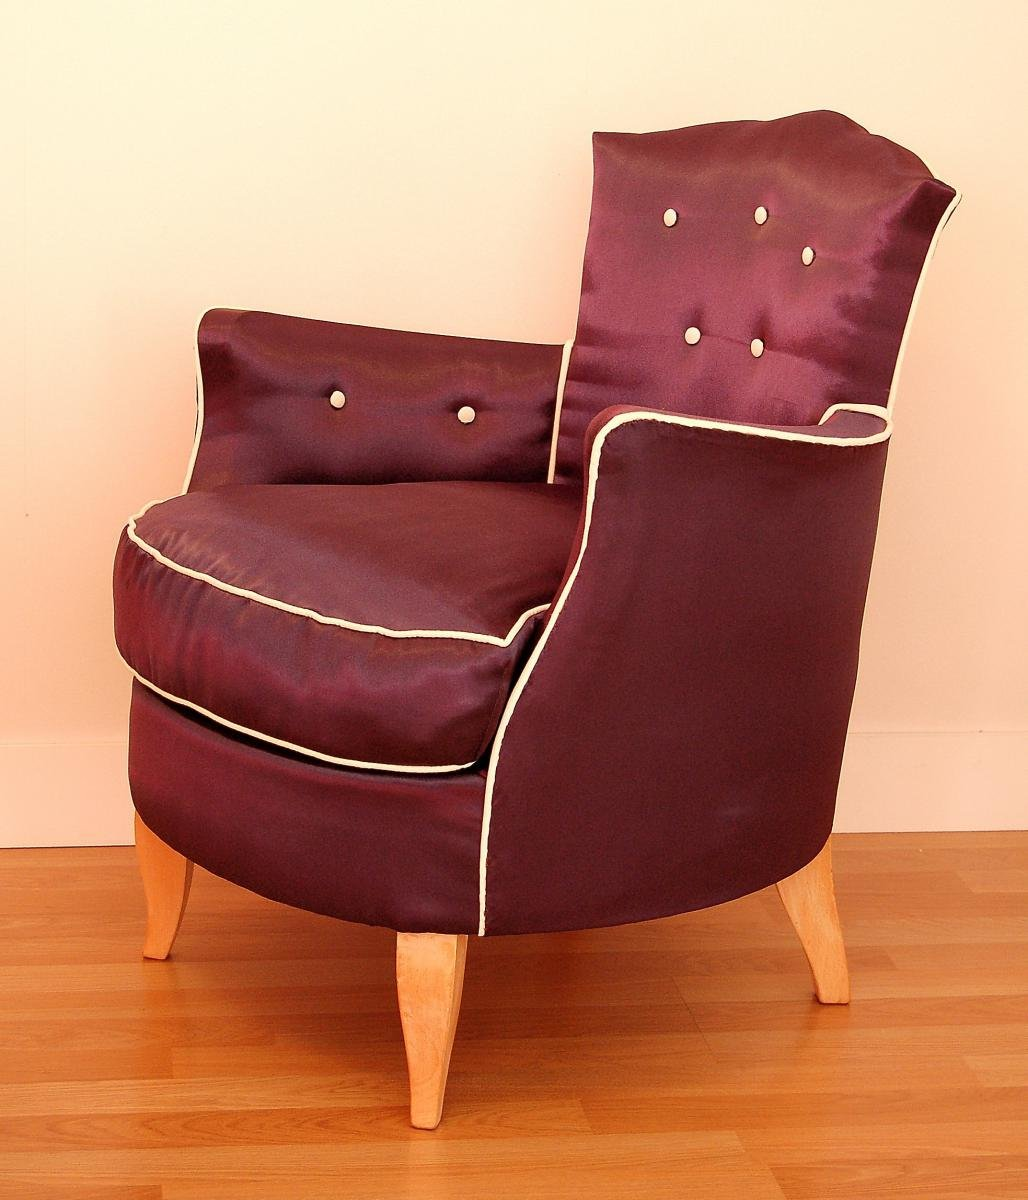 art deco sessel 1930er bei pamono kaufen. Black Bedroom Furniture Sets. Home Design Ideas